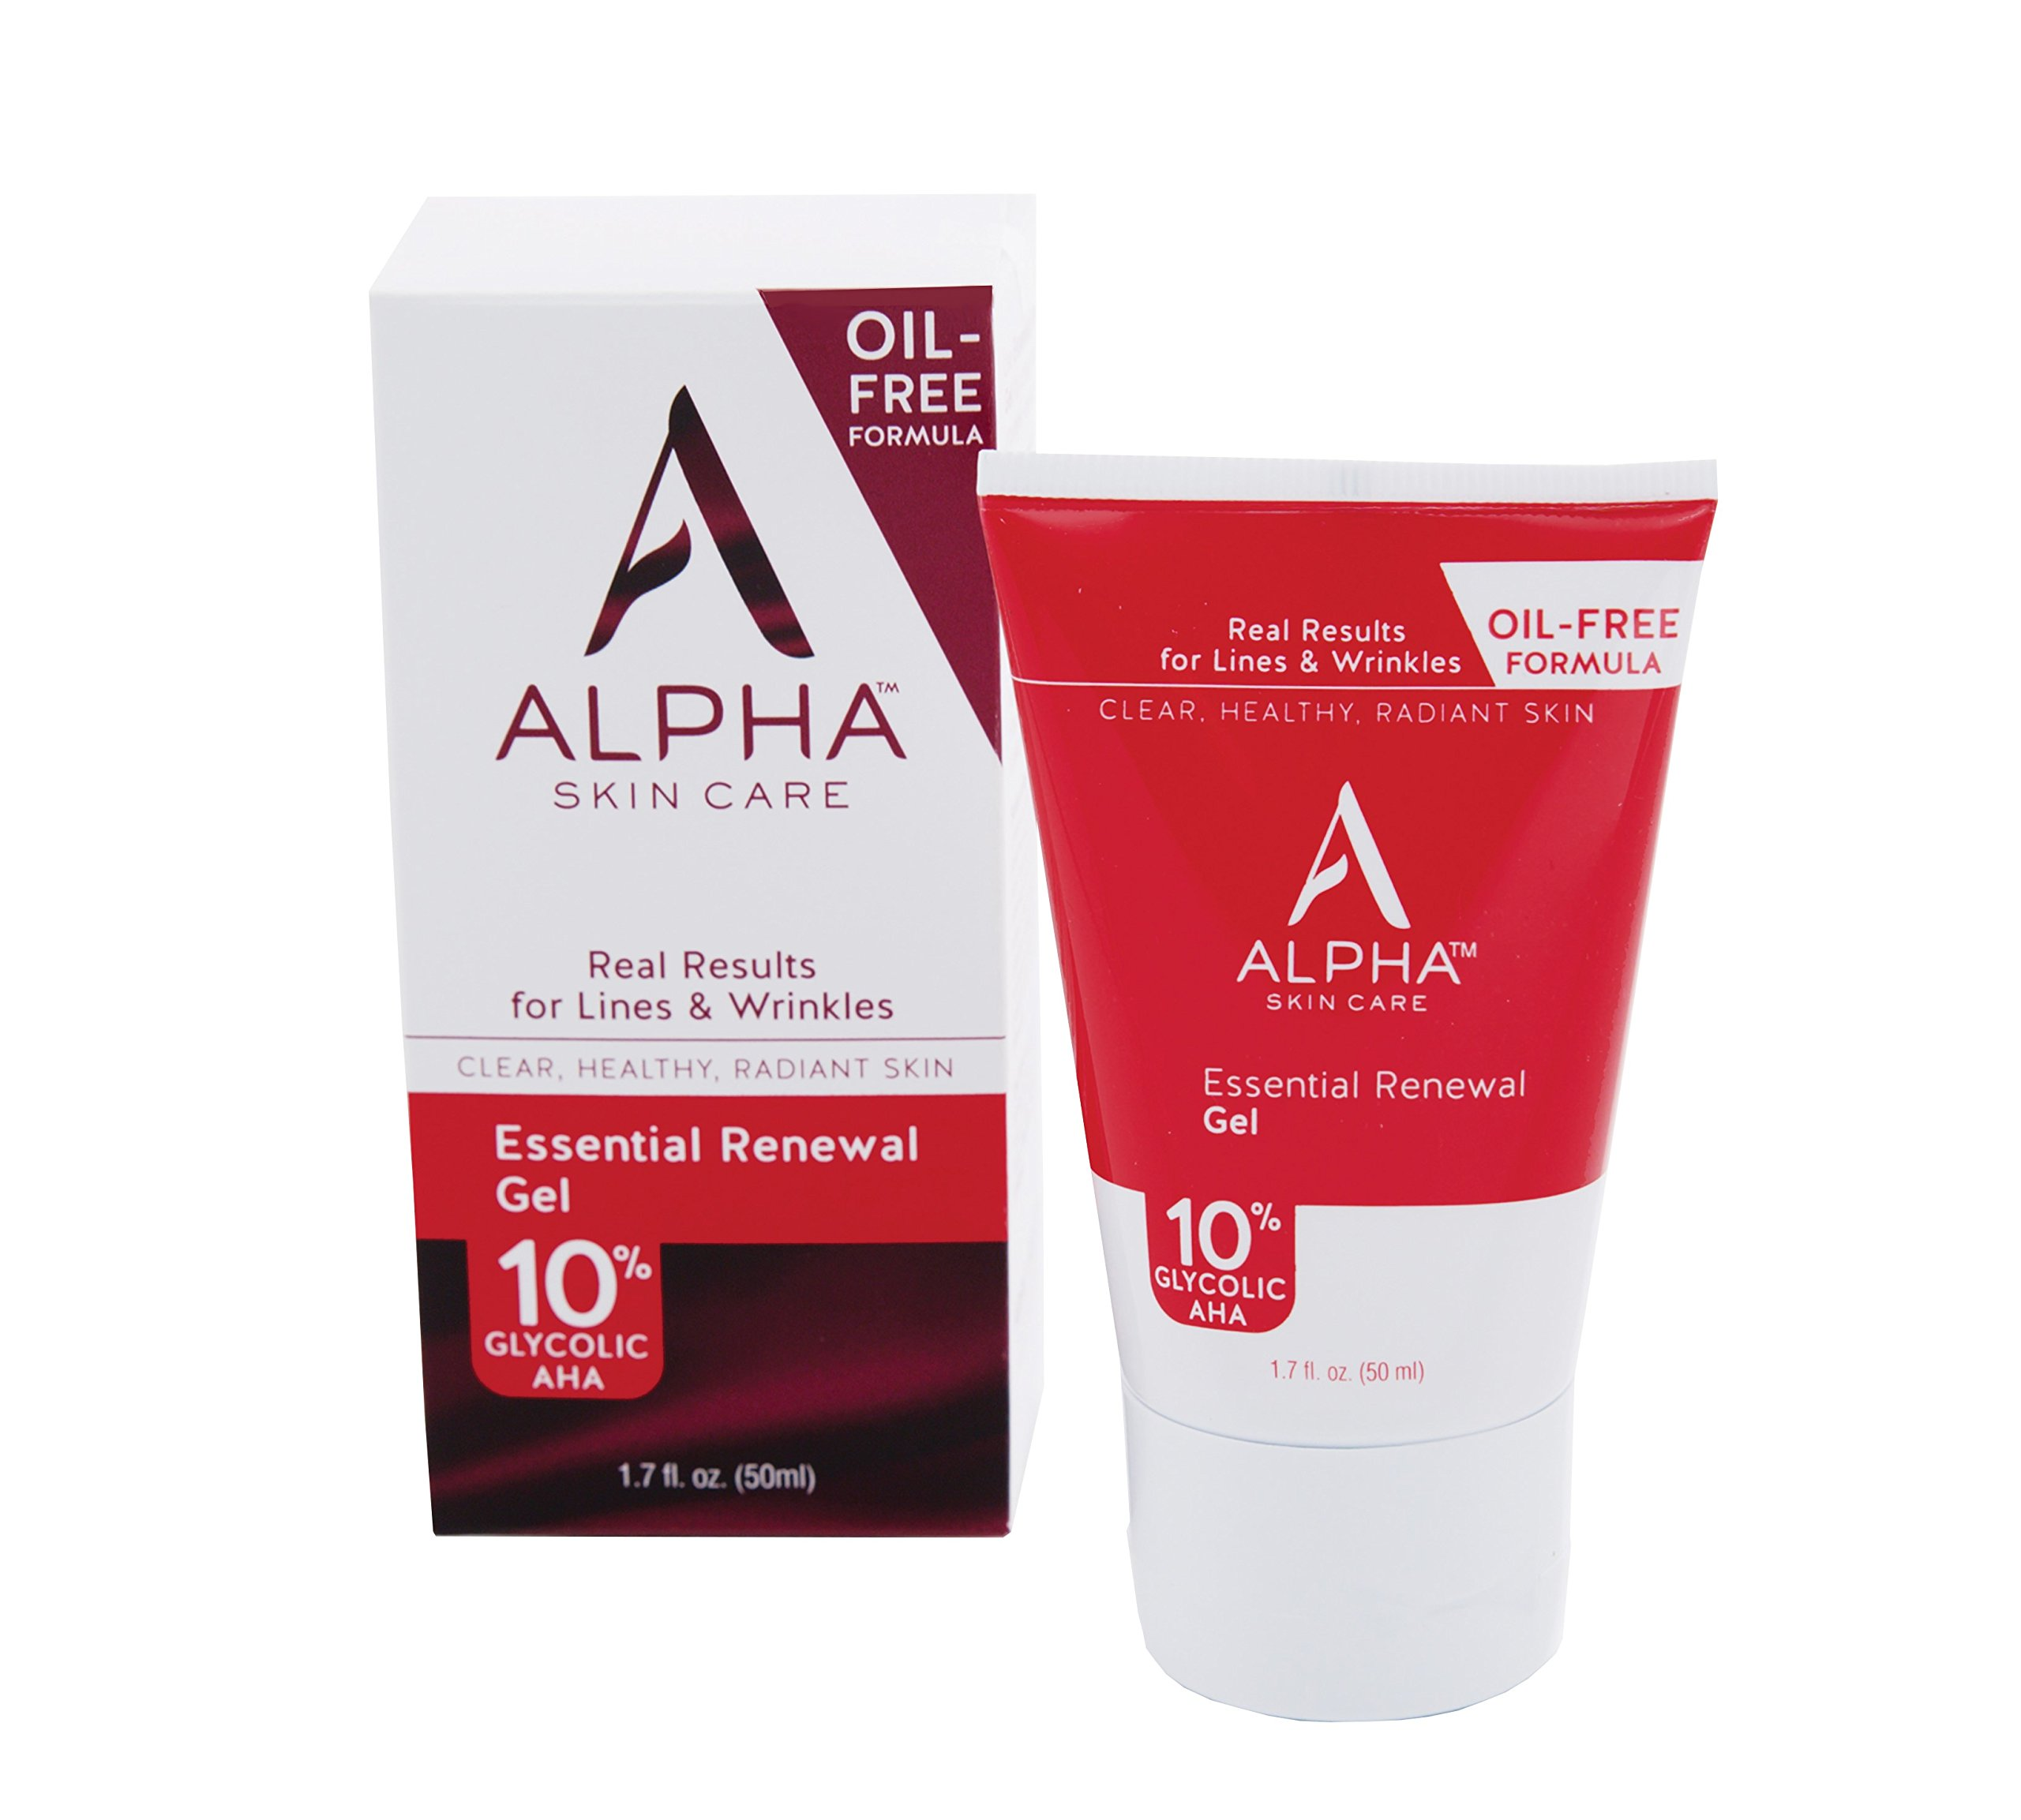 Alpha Hydrox Oil-Free Essential Renewal Gel 1.70 oz (Pack of 6) Holika Holika Lazy and Easy Smooth Egg Peeling Gel, 1 Ounce